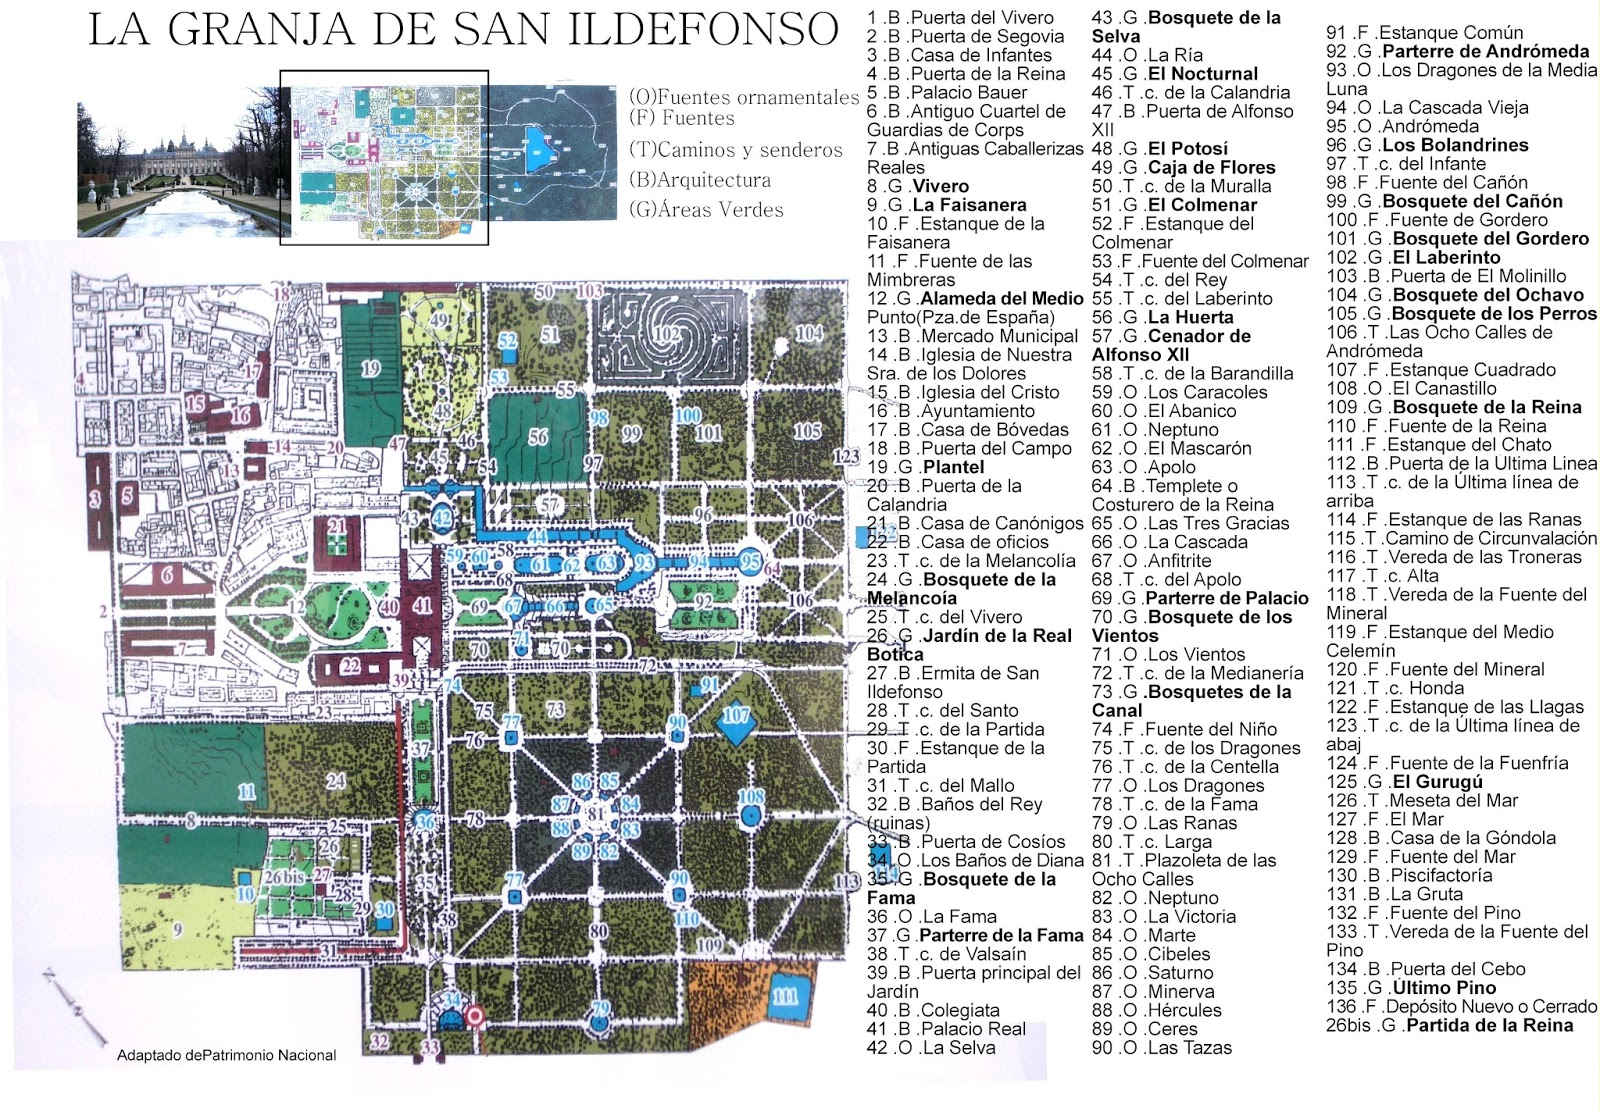 Plano del real sitio de la granja de san ildefonso for Jardines de san ildefonso